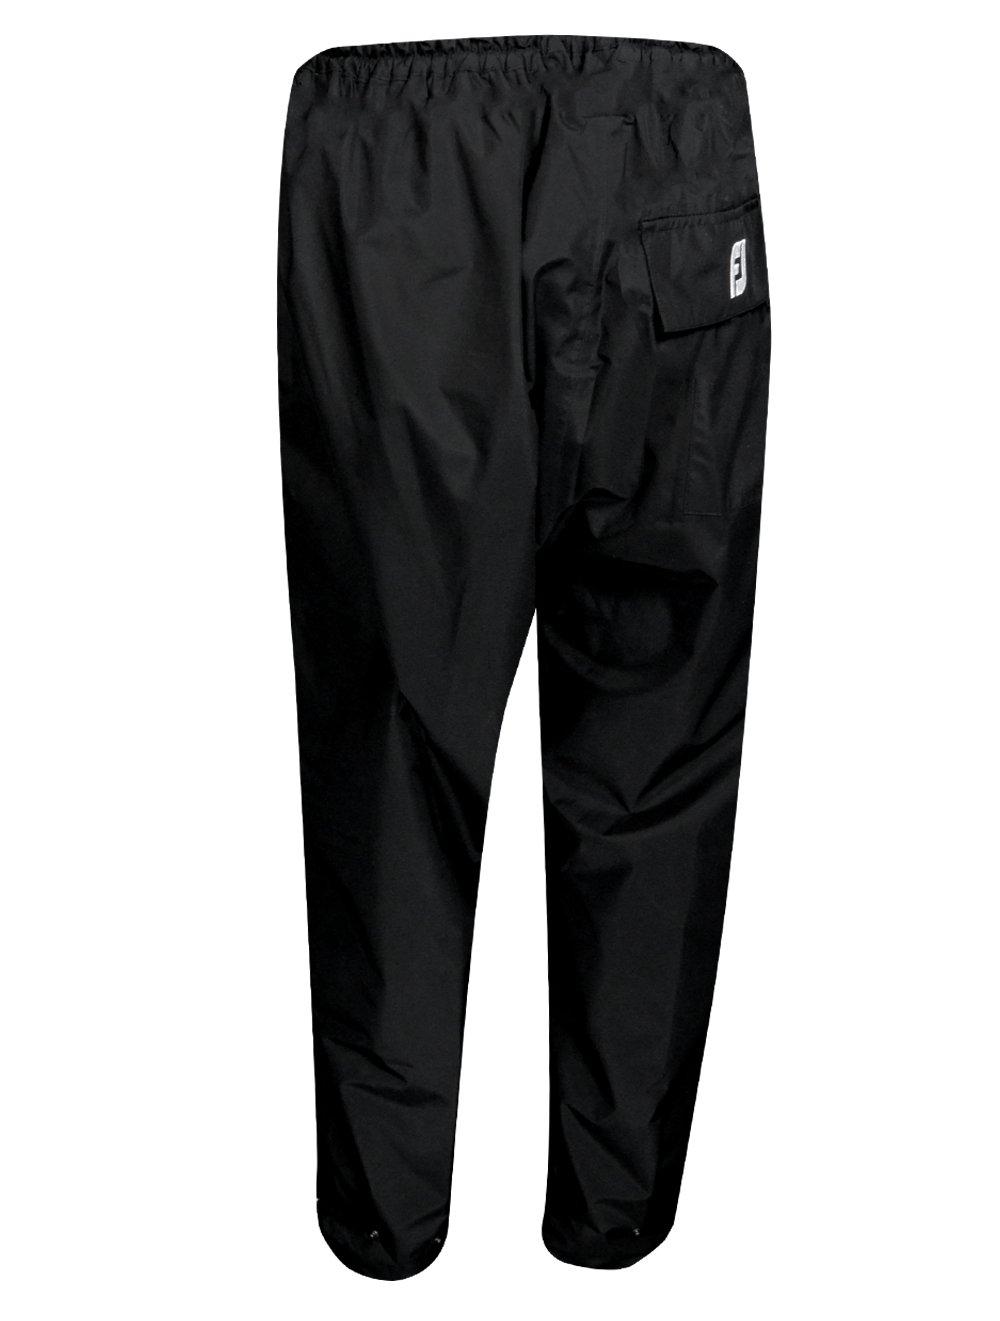 FootJoy Golf- Hydrolite Rain Pants, Black, Medium